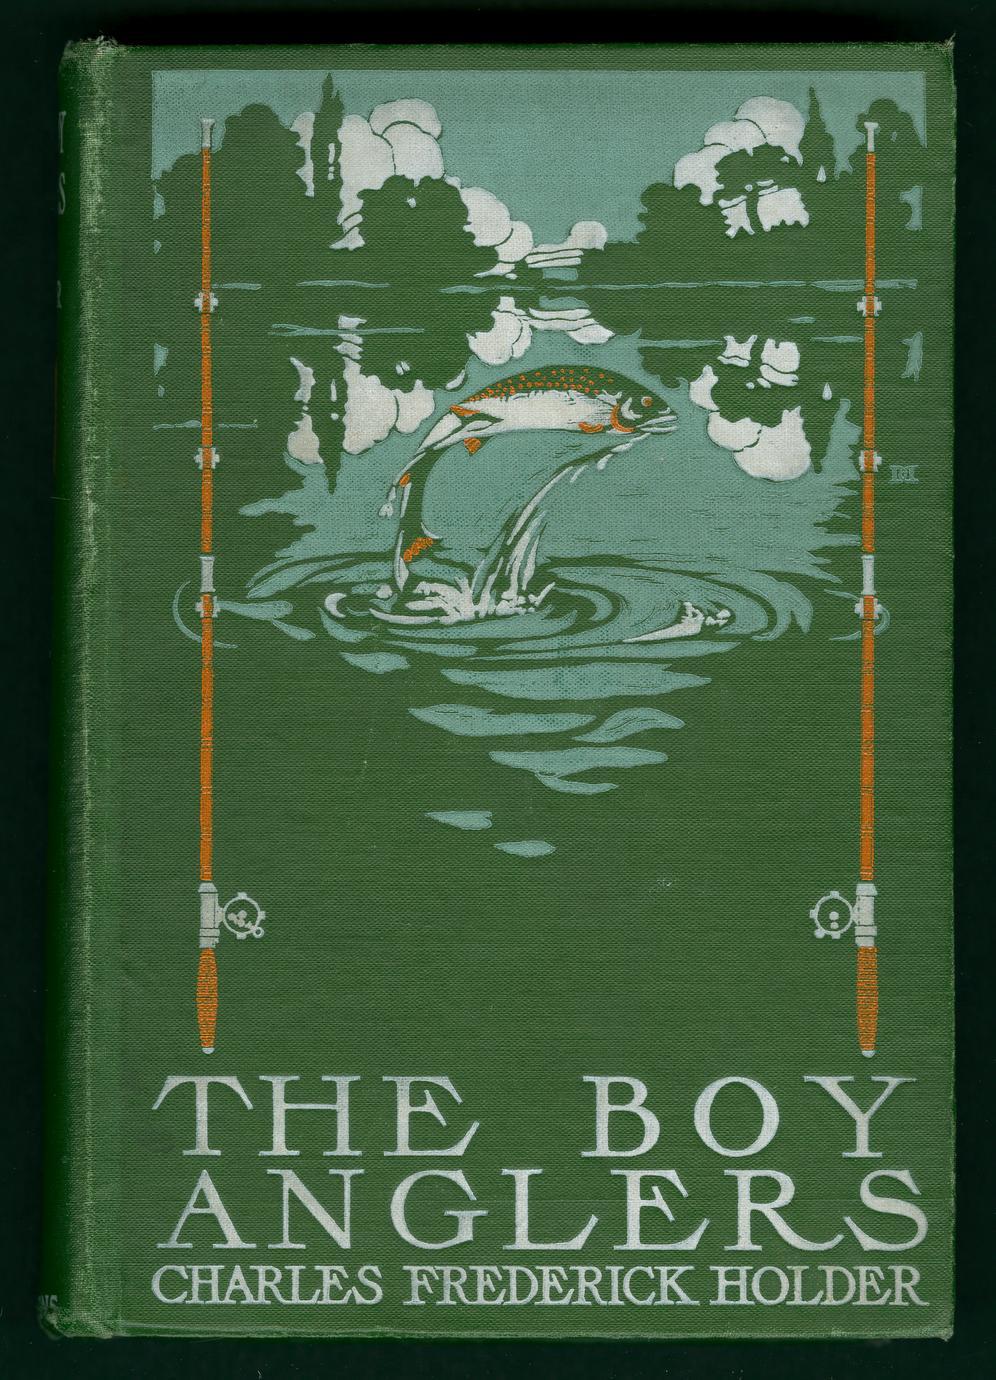 The boy anglers